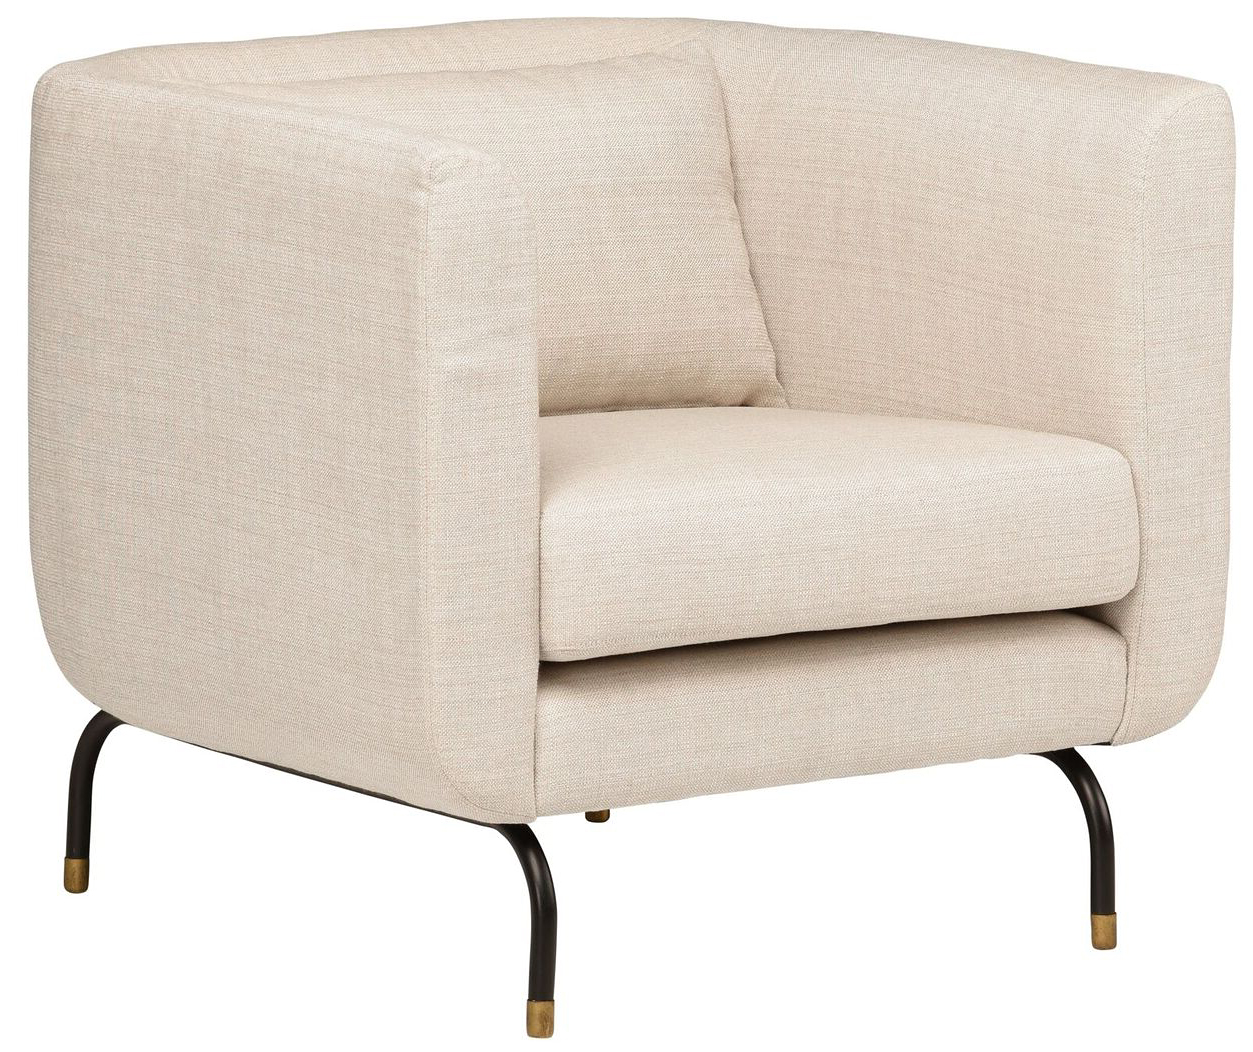 nuevo living gabriel single chair sand